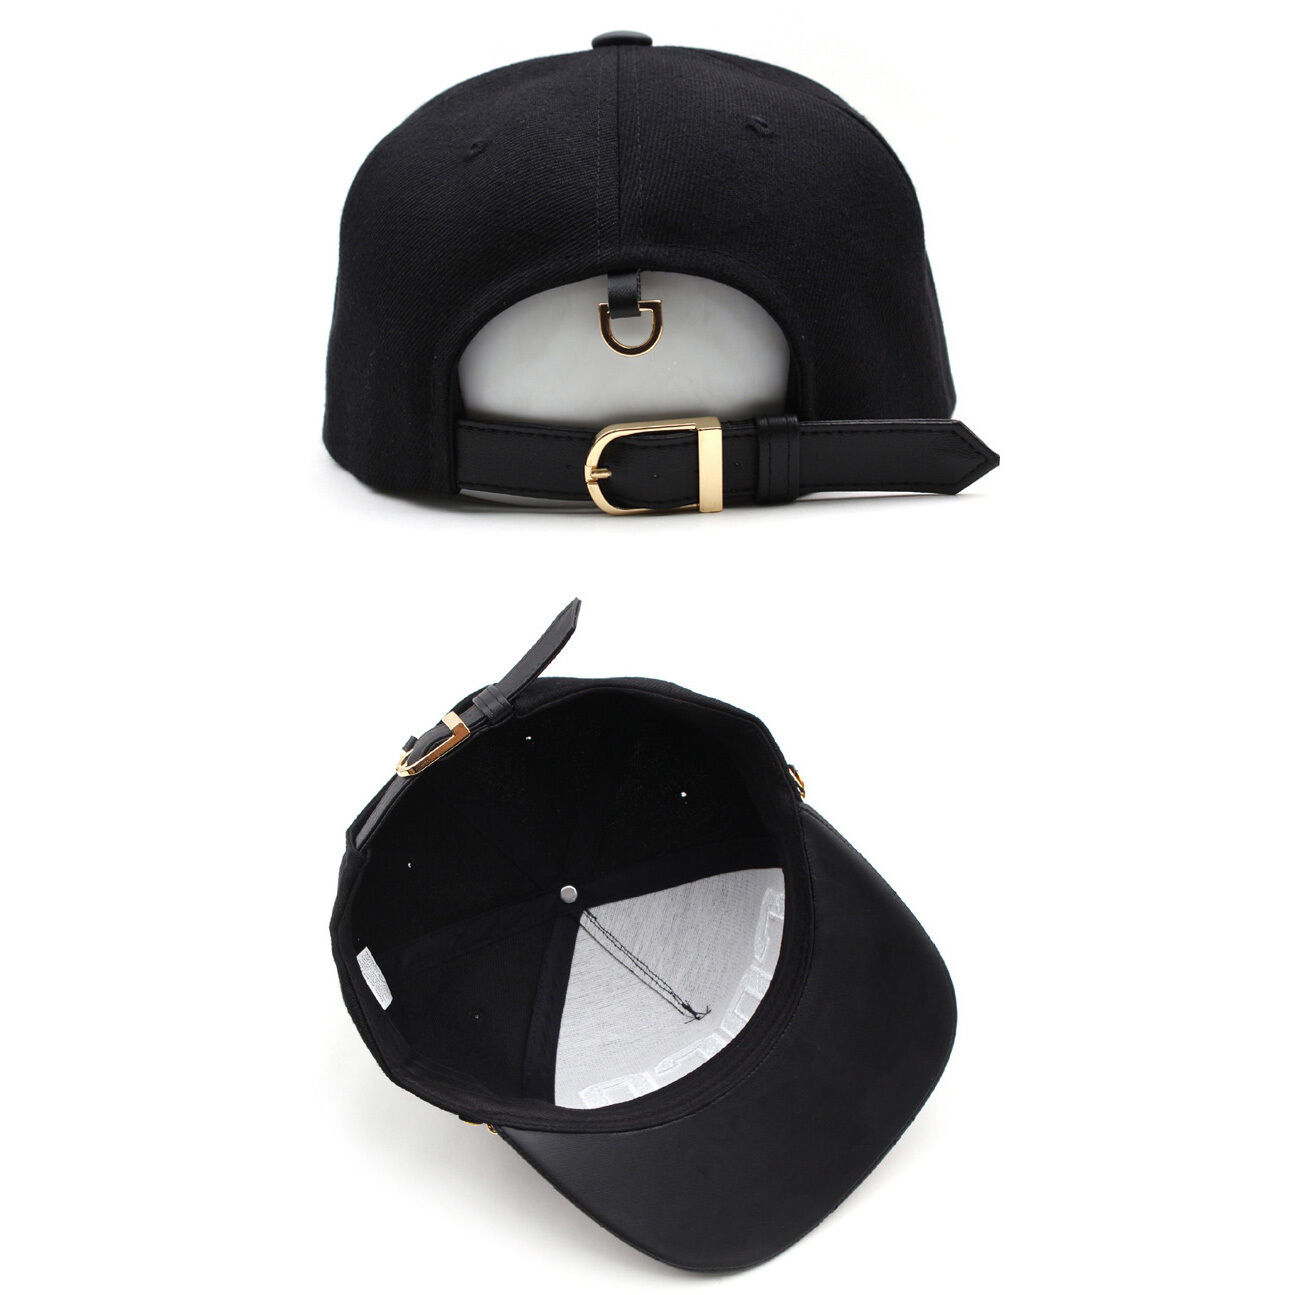 e80cc2b33bf Unisex Mens Womens Teamlife Coco Chain Casual Baseball Cap Strapback Hats  White